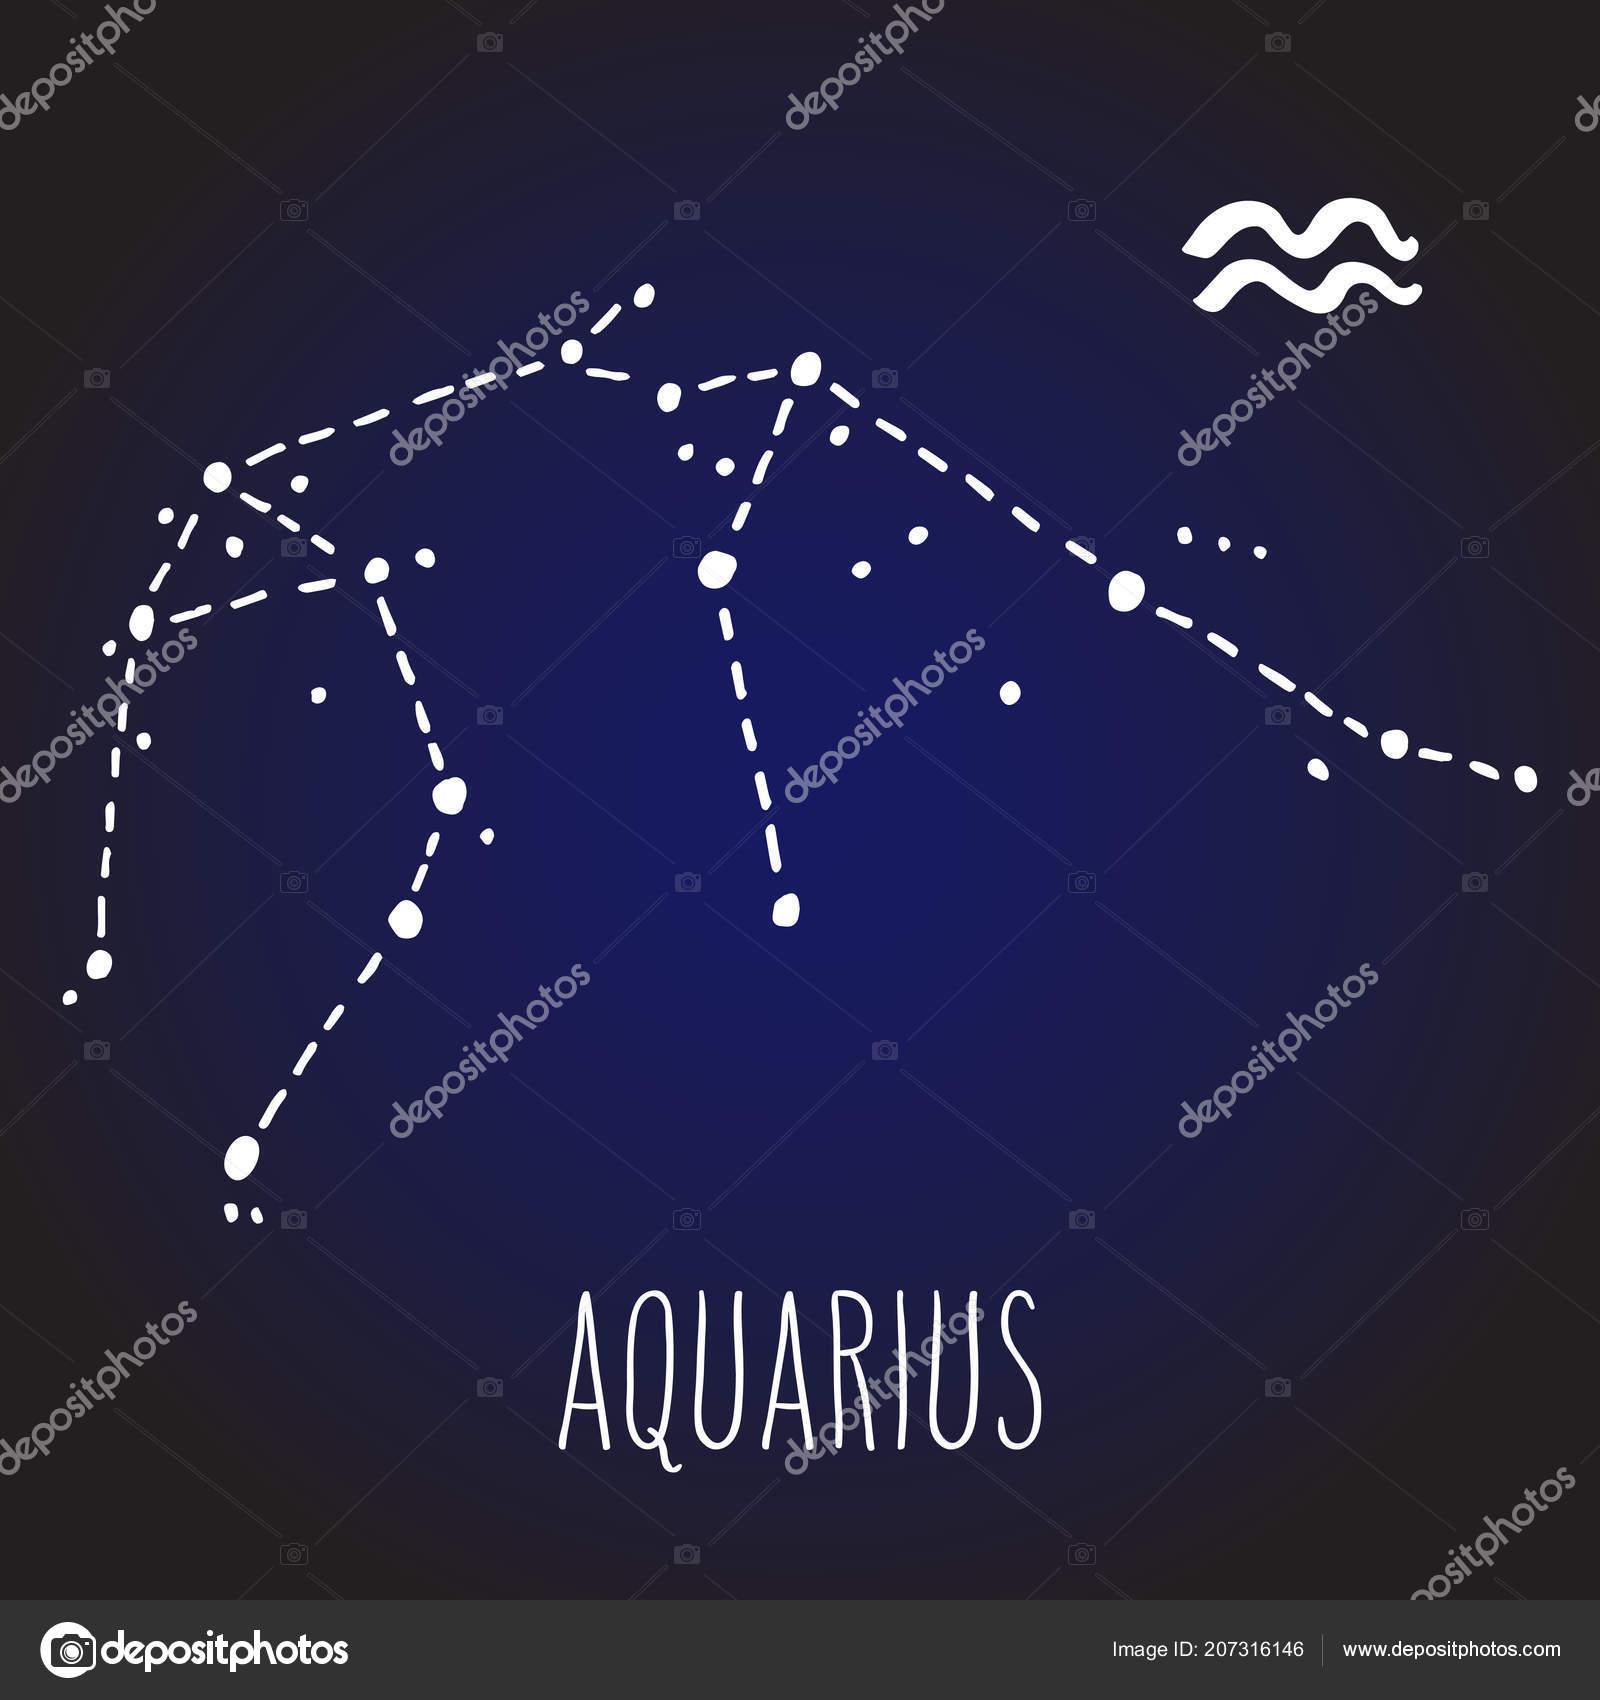 Aquarius Hand Drawn Zodiac Sign Constellation White Dark